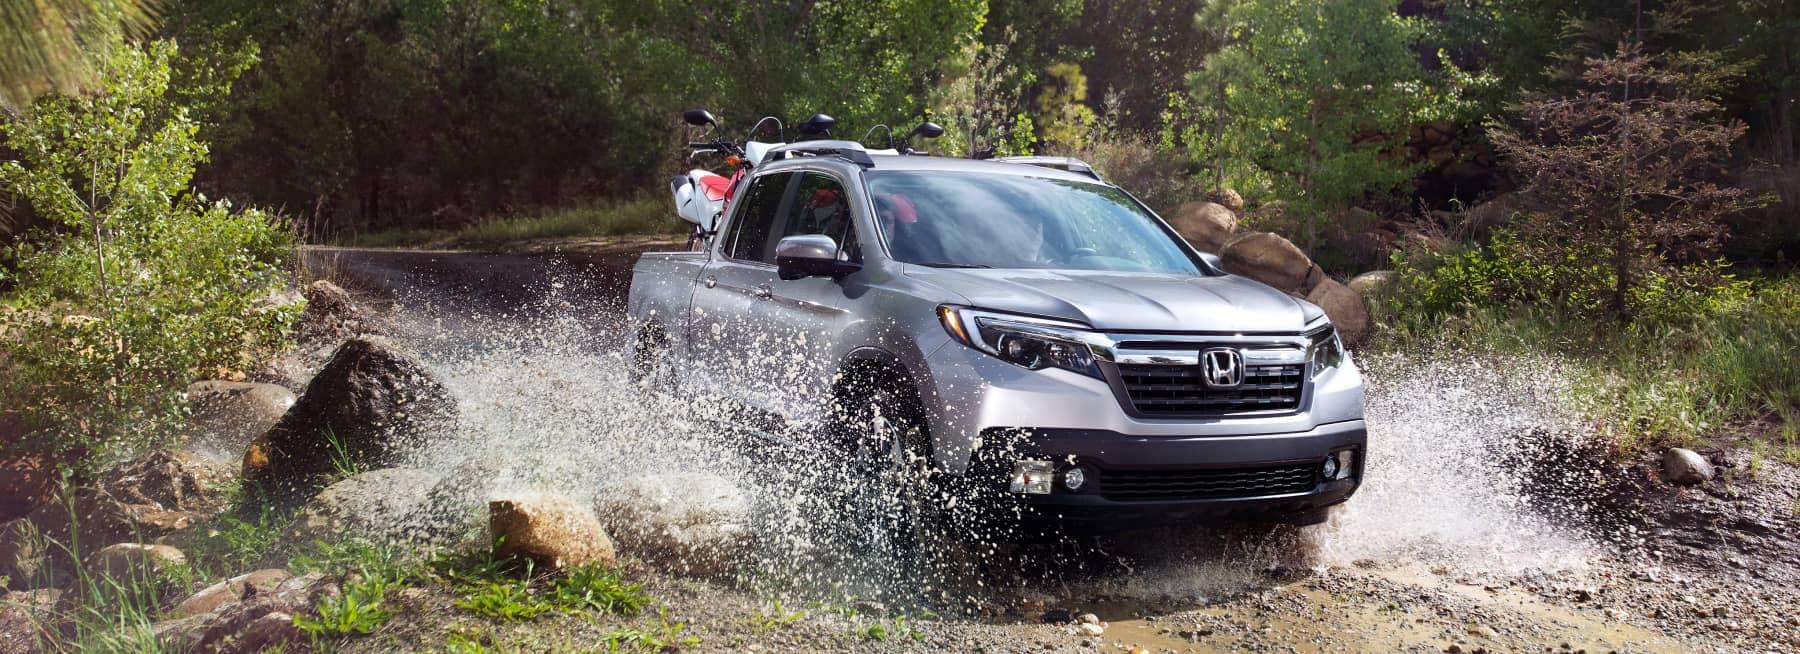 Honda Ridgeline driving through water